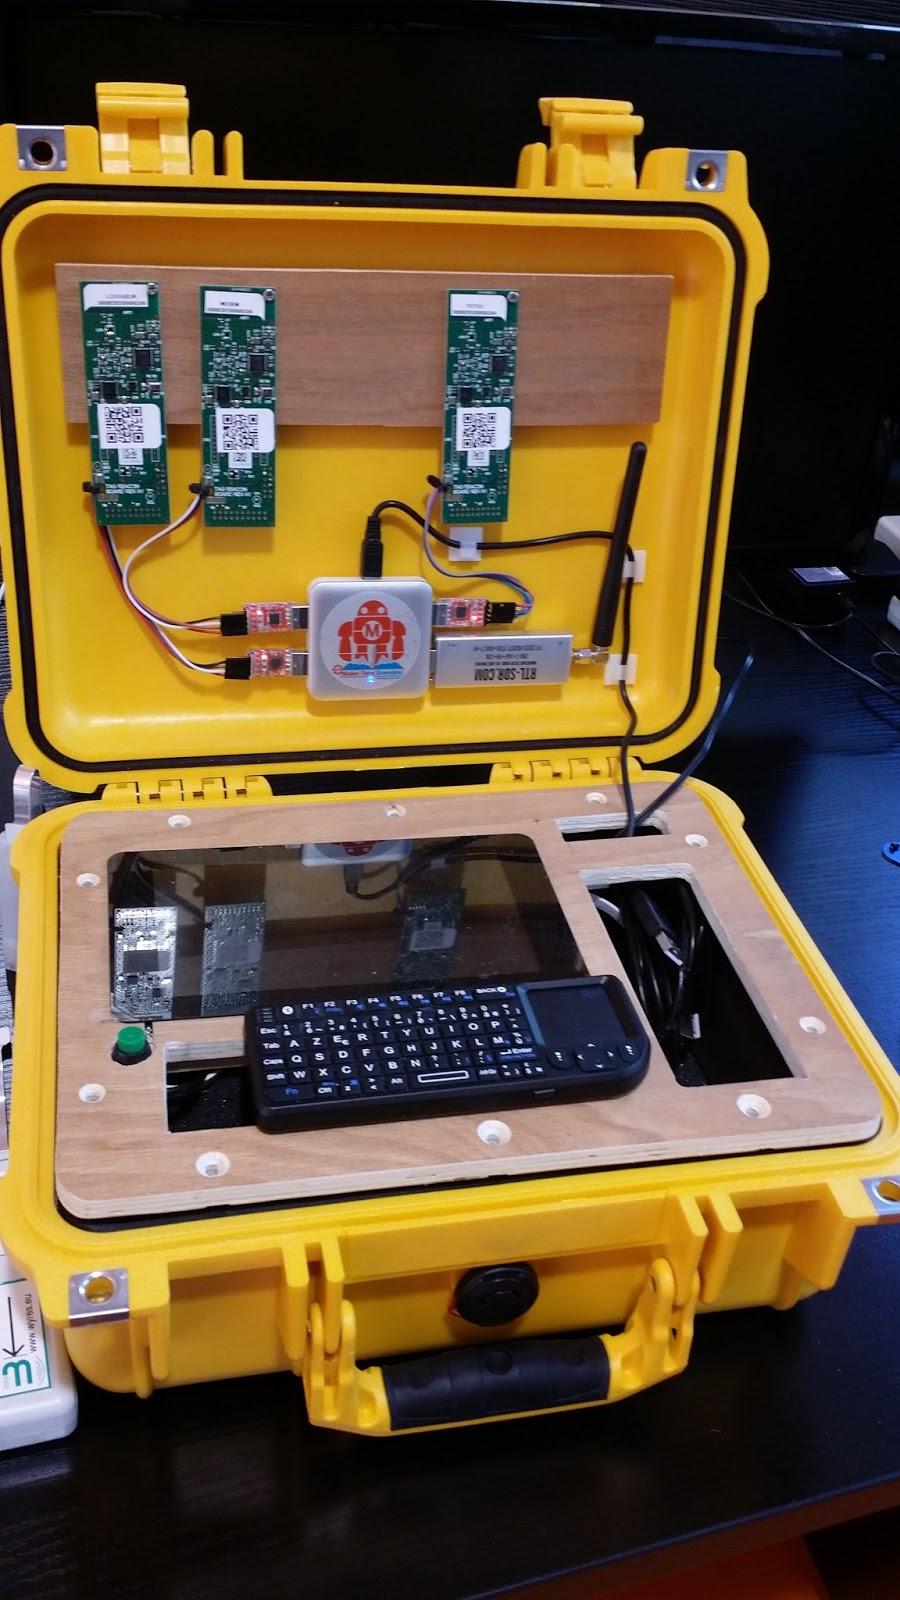 Wyres Tech blog: ISM band 868MHz / LoRaWAN Radio Tester